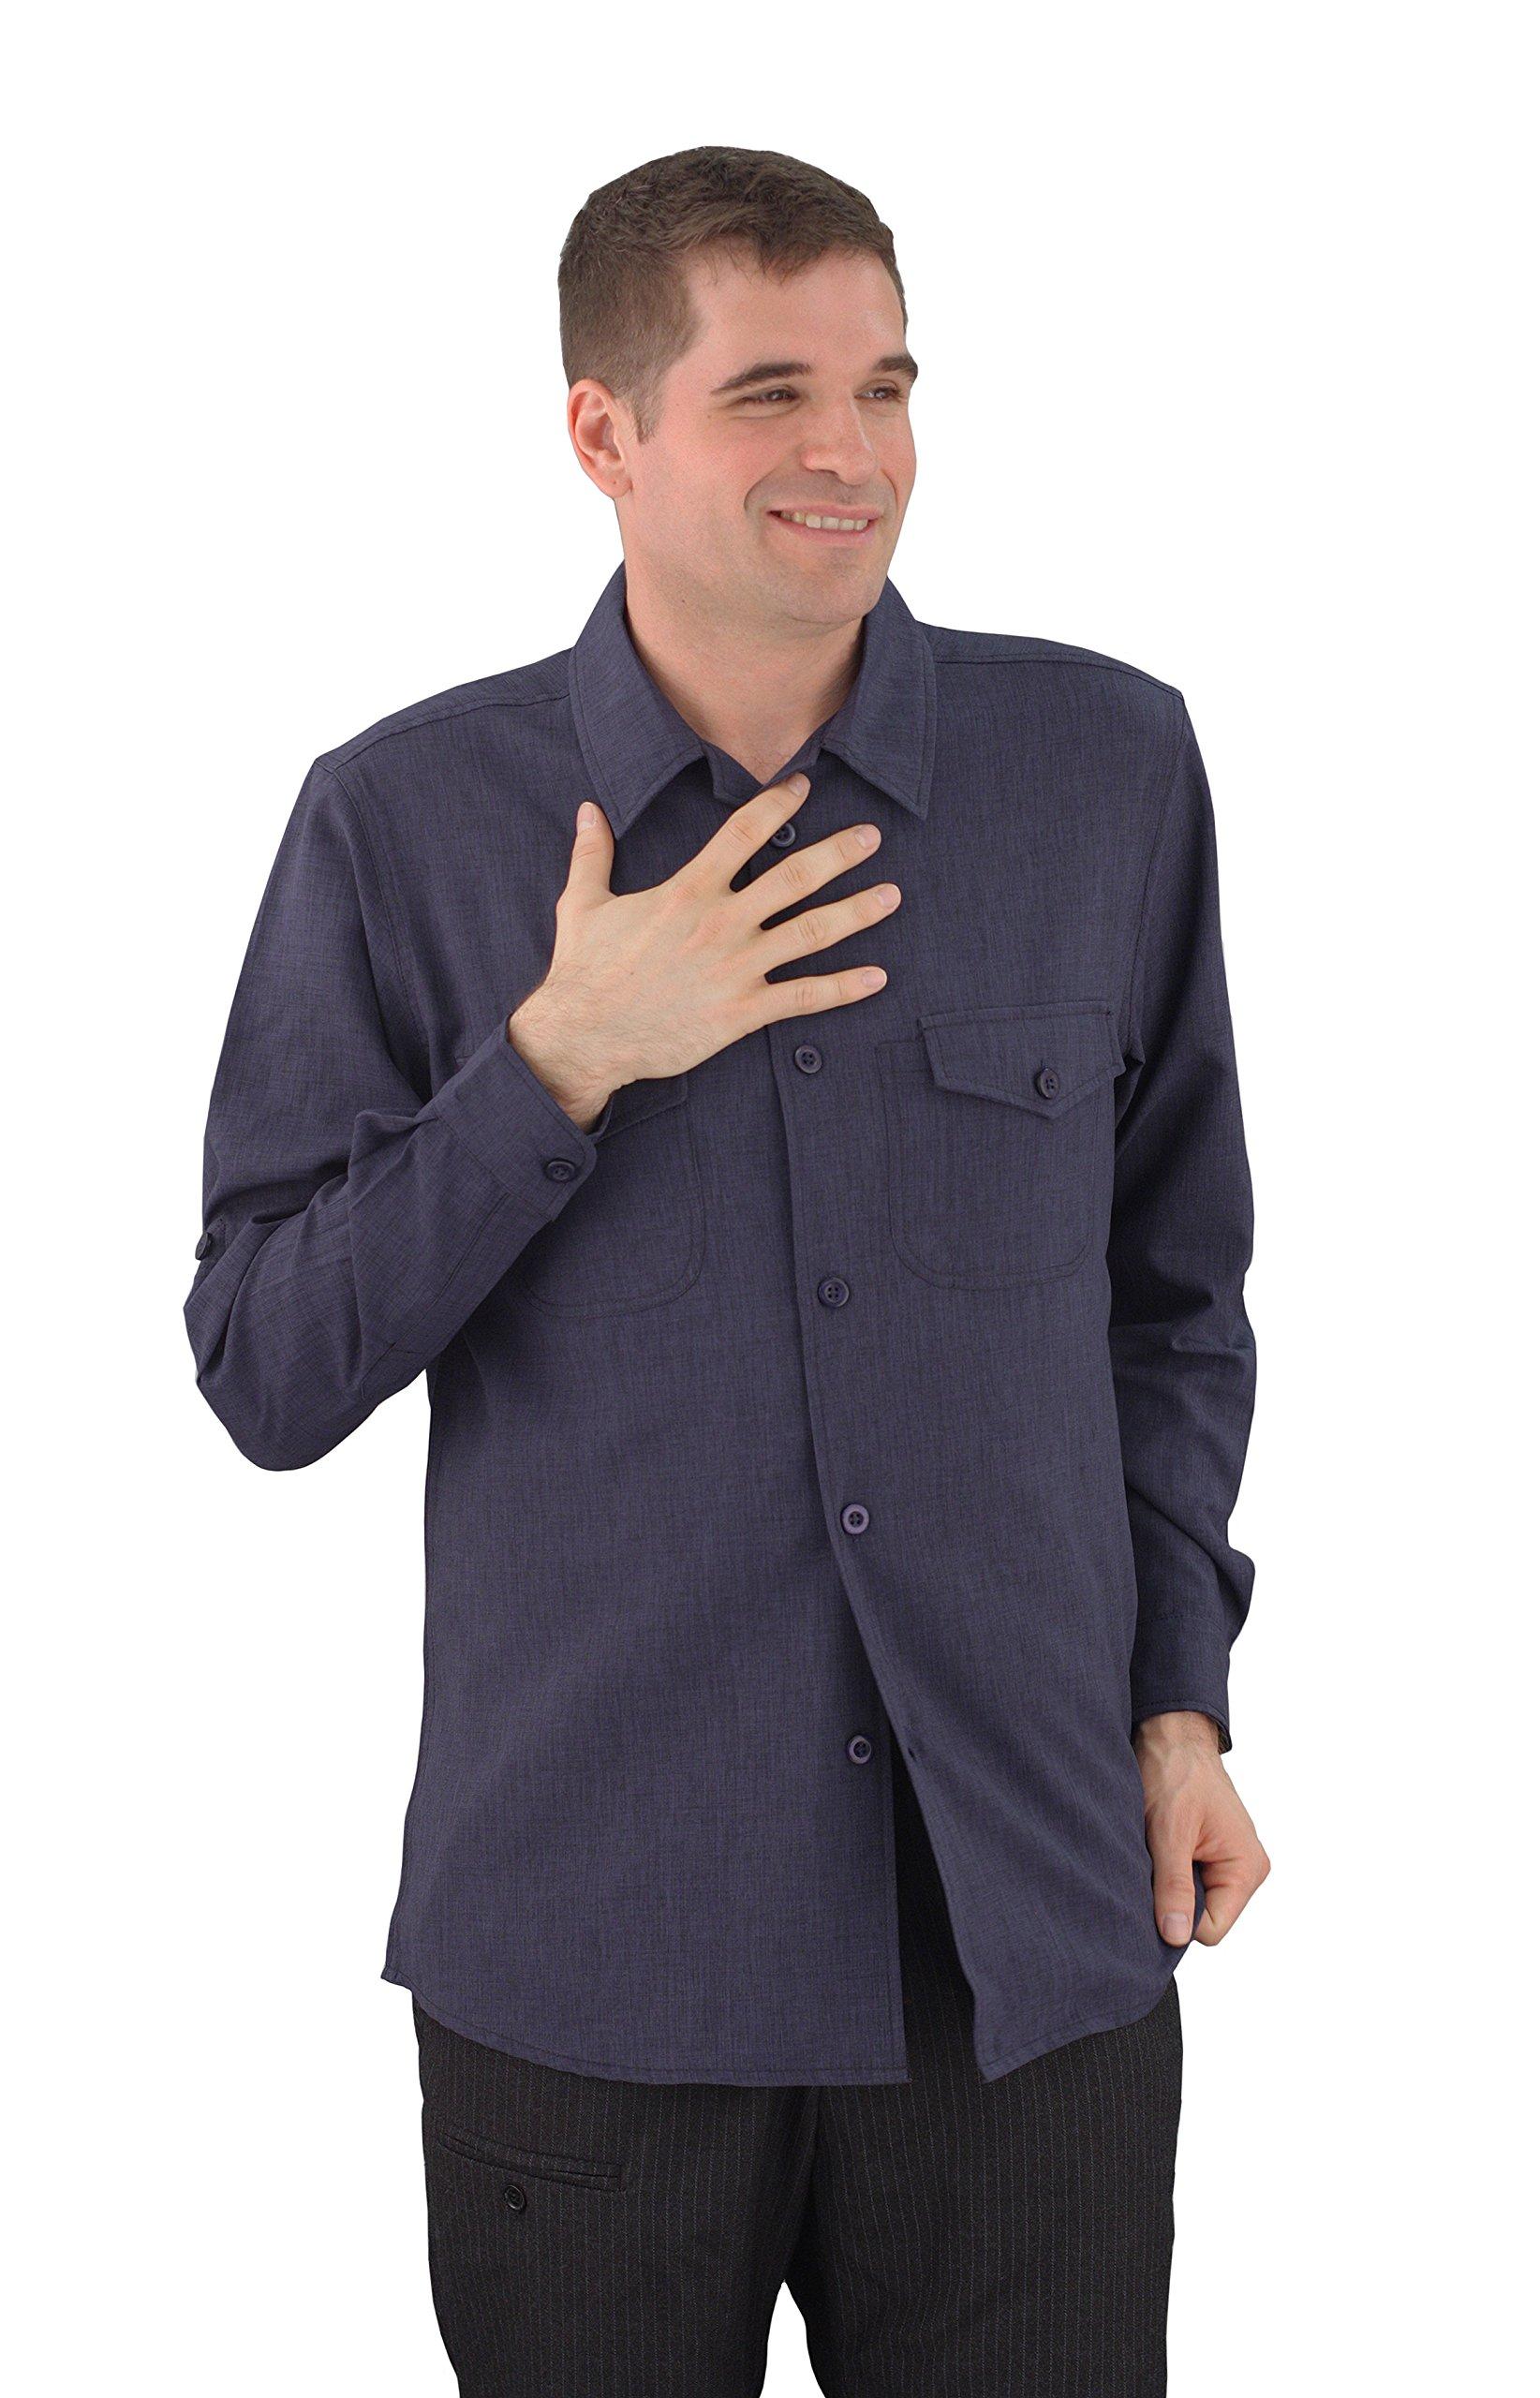 ASD Living Zanzibar Long Sleeve Dry Fit Server Waitstaff Shirt, X-Large, Navy Blue by ASD Living